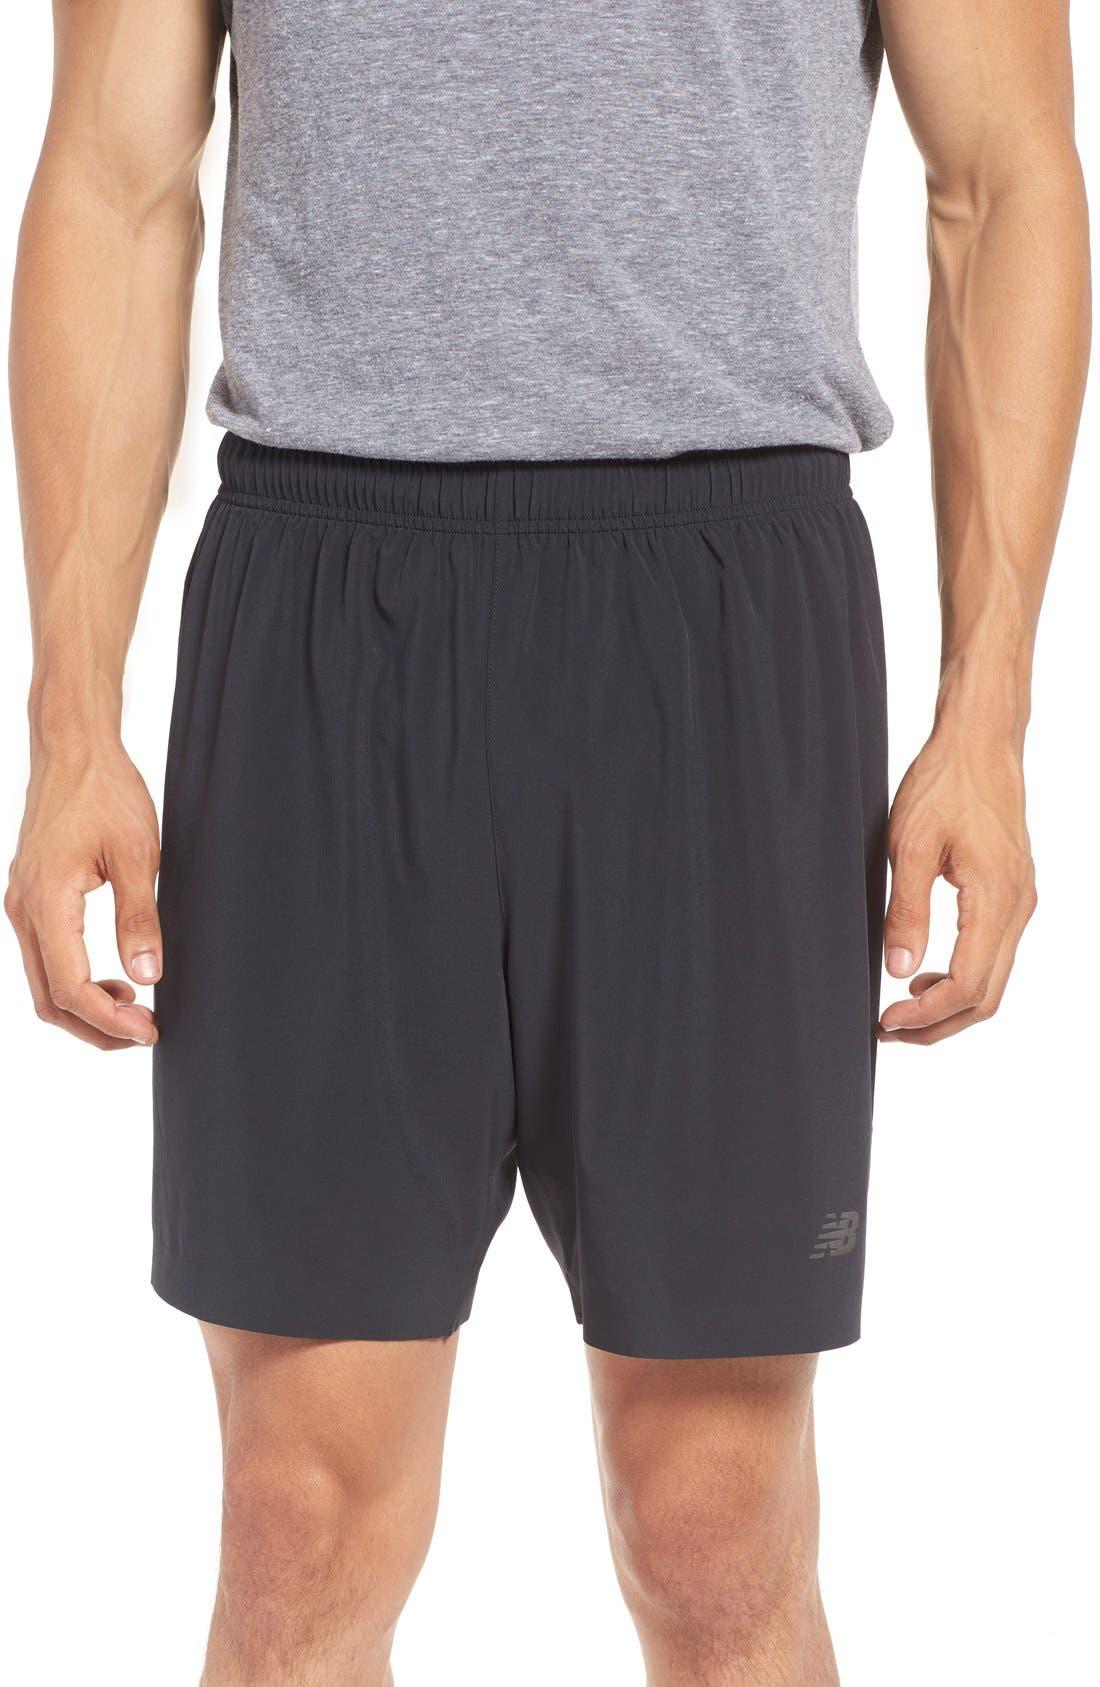 'Shift' Athletic Fit Training Shorts,                             Main thumbnail 1, color,                             Black